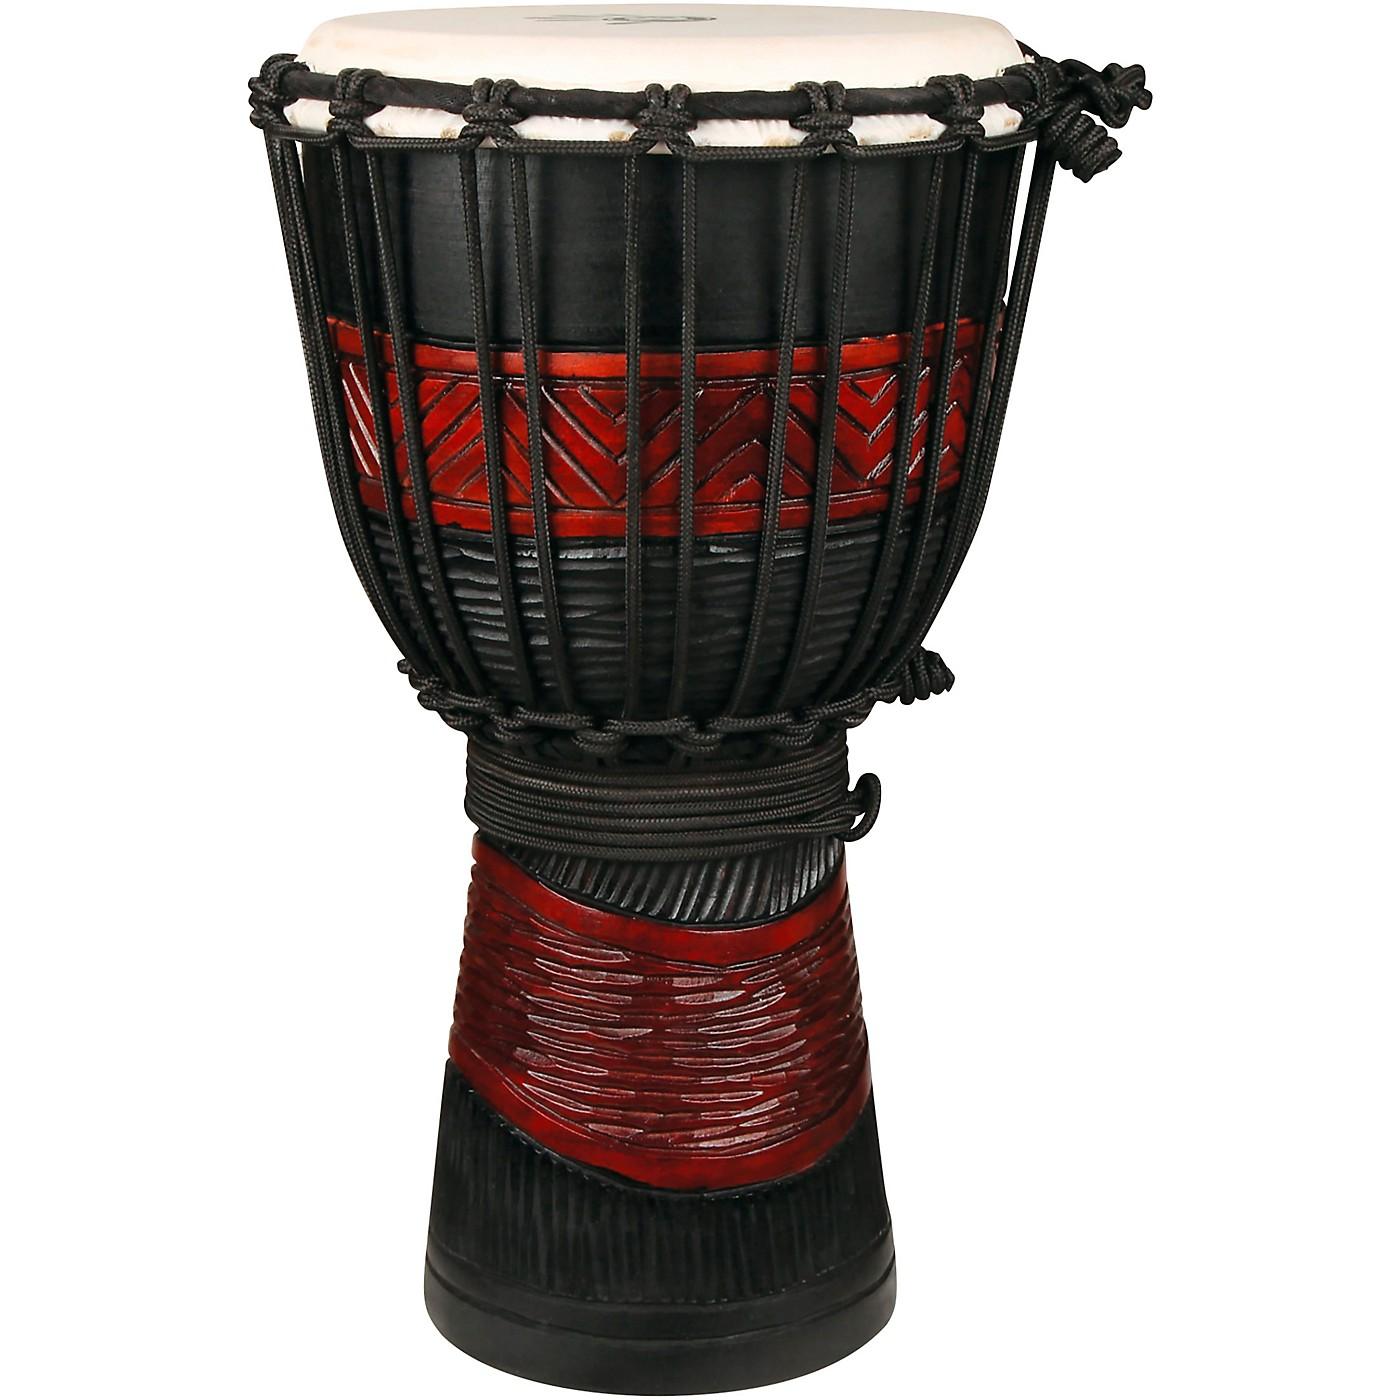 X8 Drums Red Black Djembe thumbnail